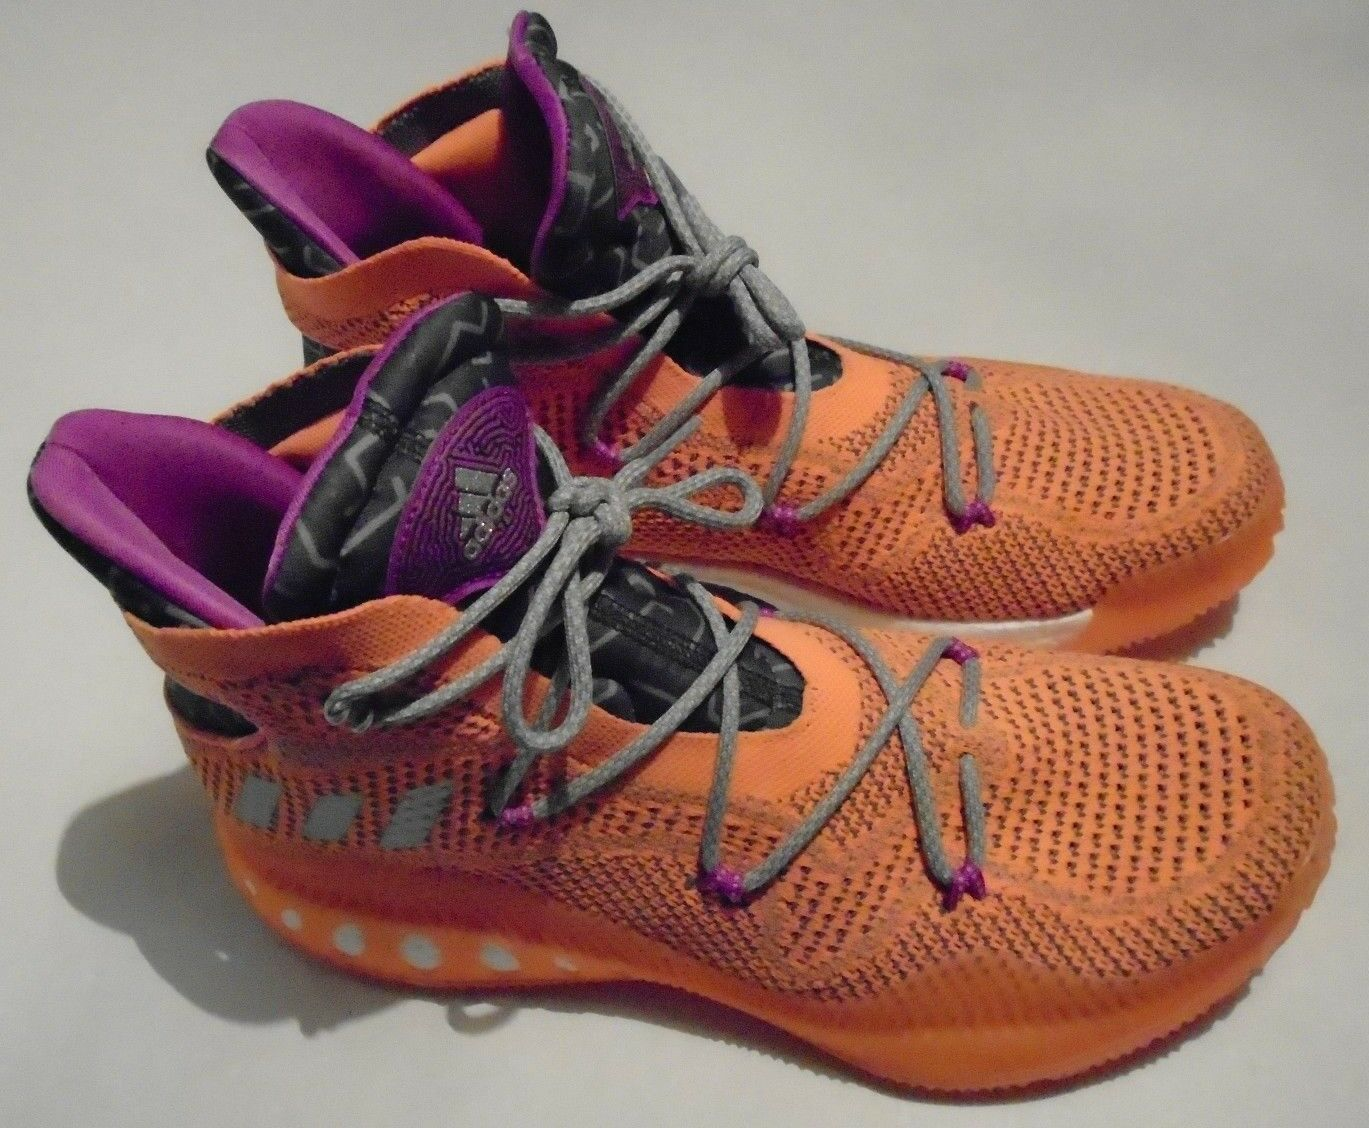 NEW Adidas Crazy Explosive Primeknit Shoes Men's Size 17 Shoes Primeknit All Star Boost BB8370 b221b2